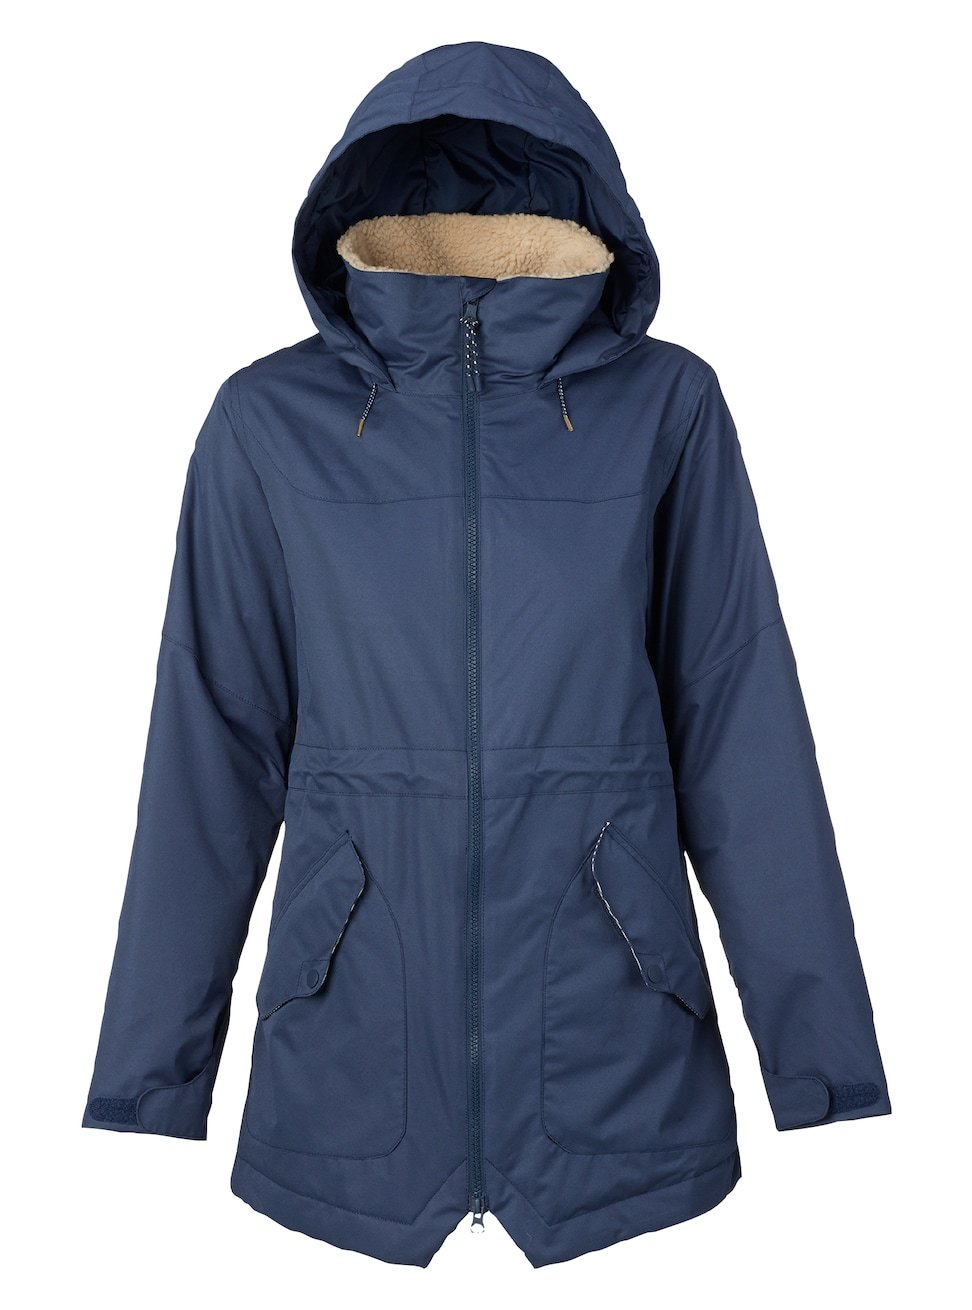 Burton Damen Prowess Jacket Snowboardjacke BRRS5 #Burton 10083104400